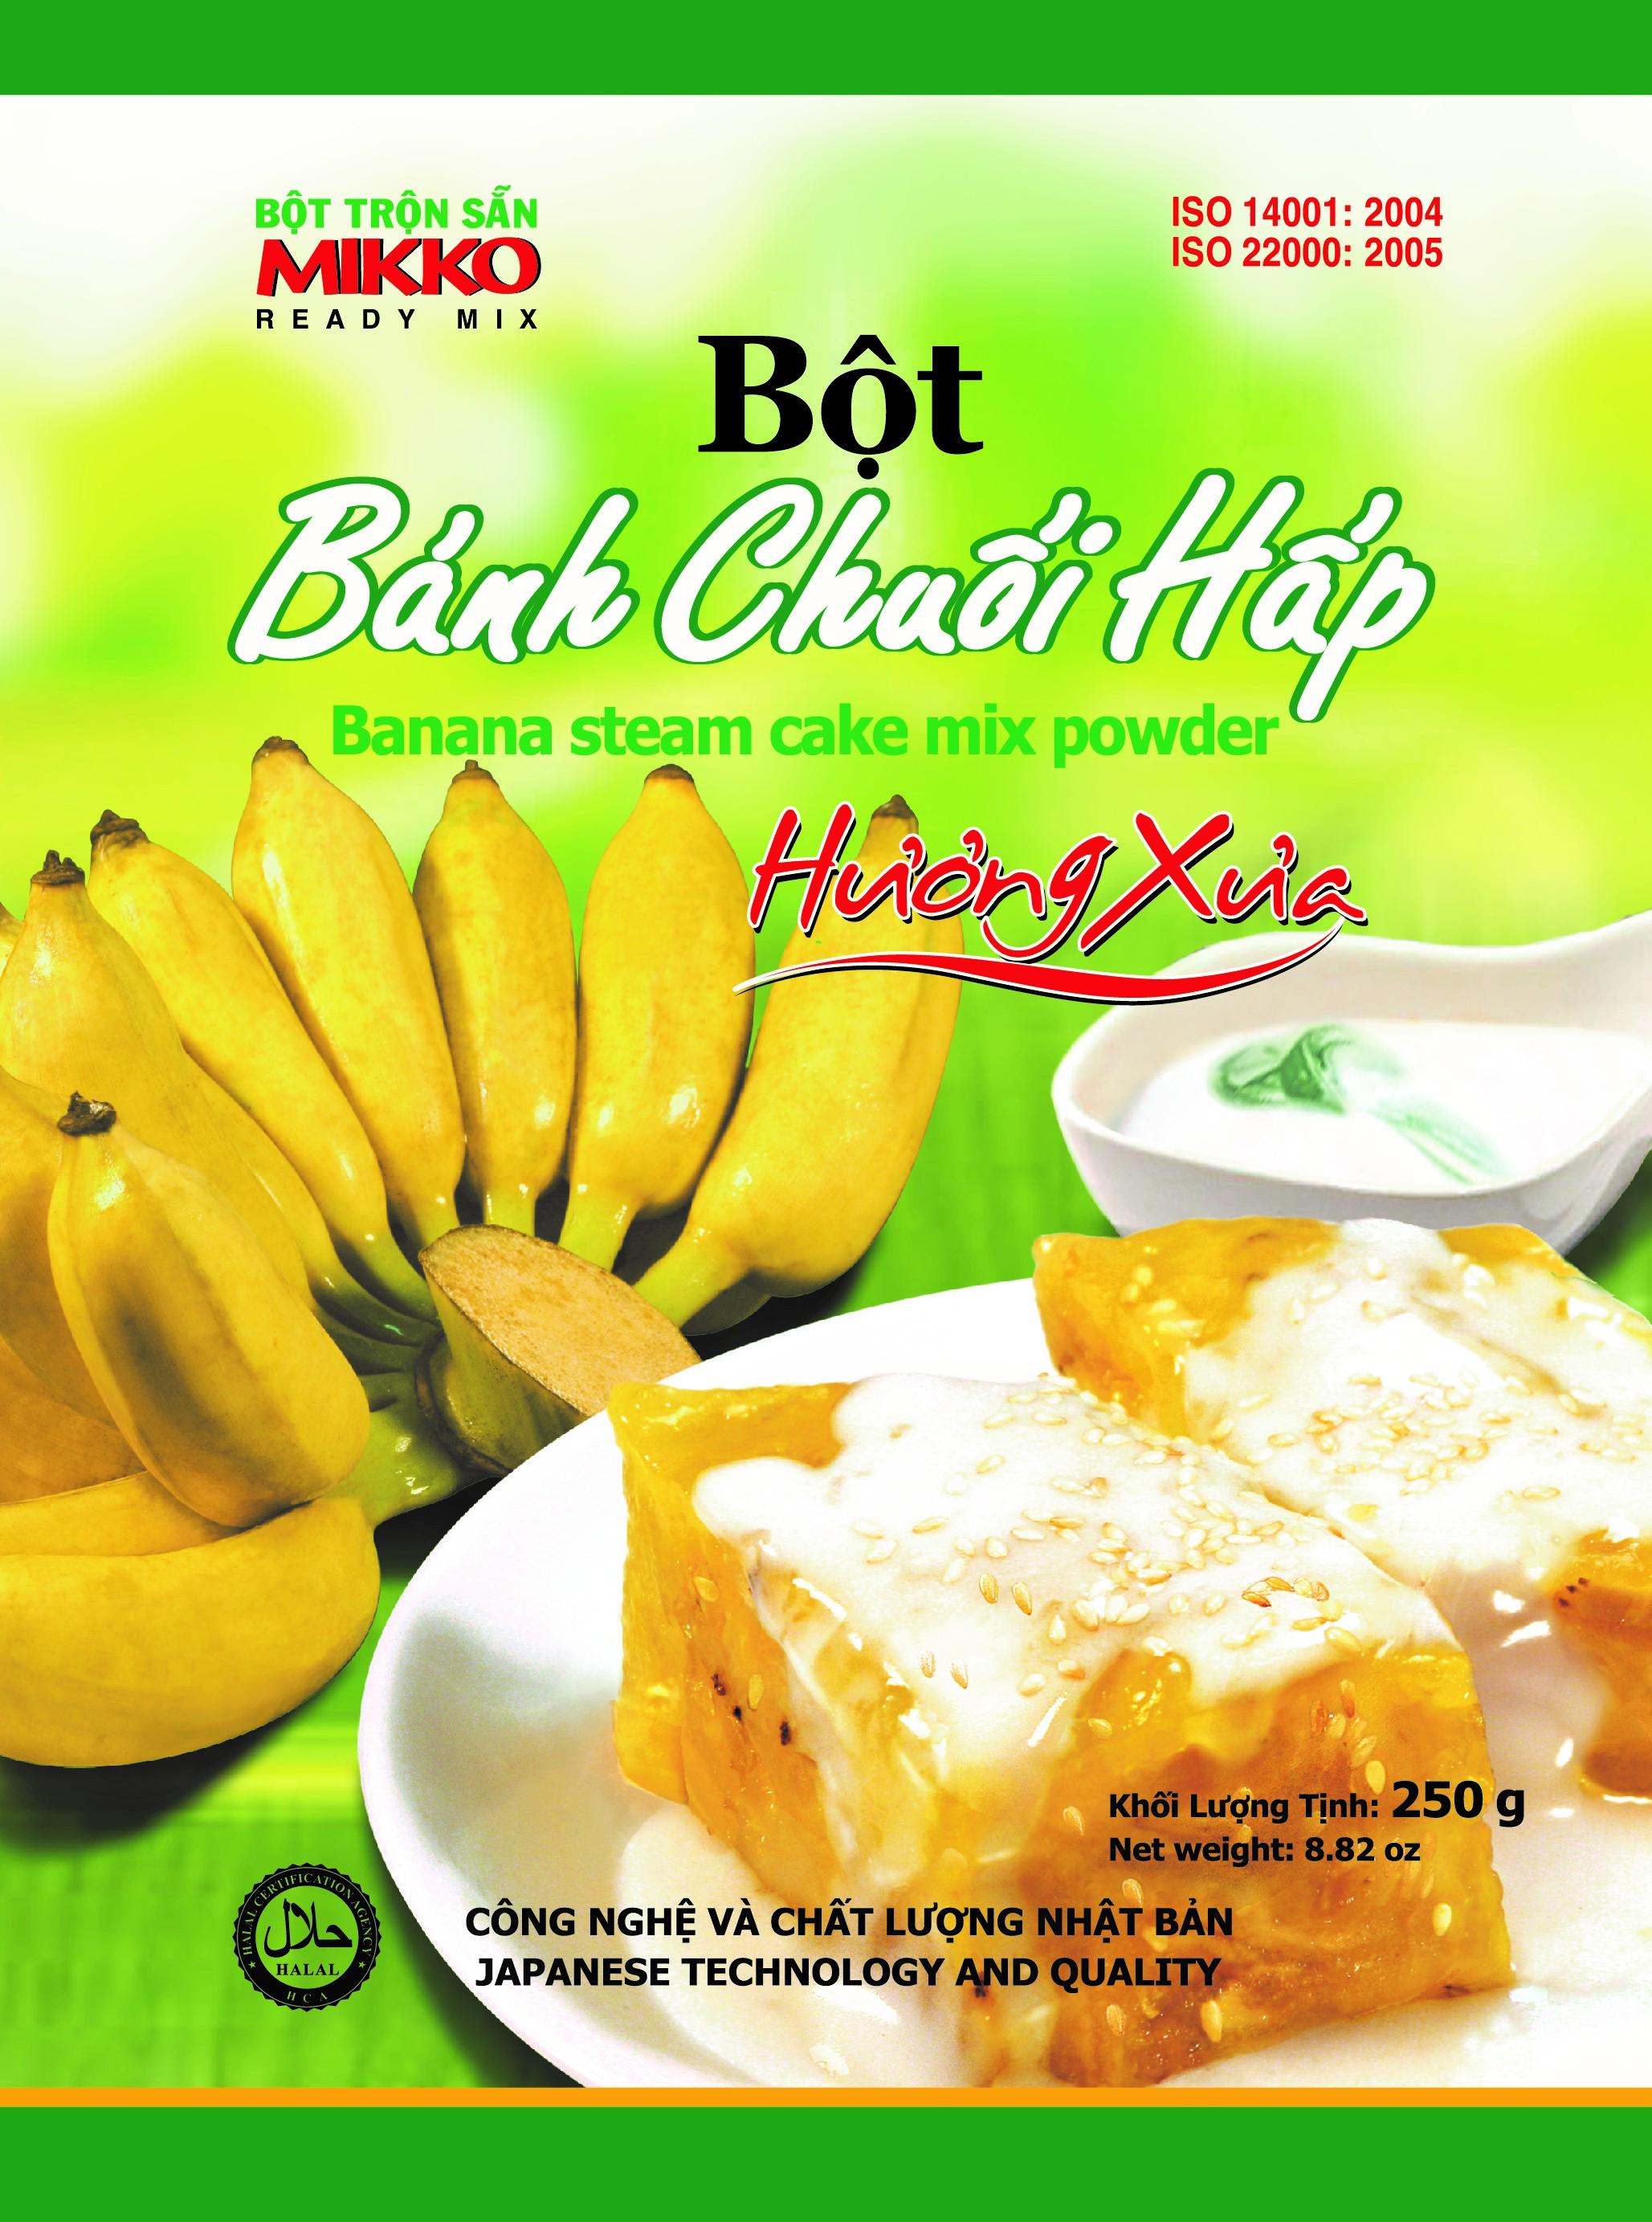 bot-banh-chuoi-hap-mikko